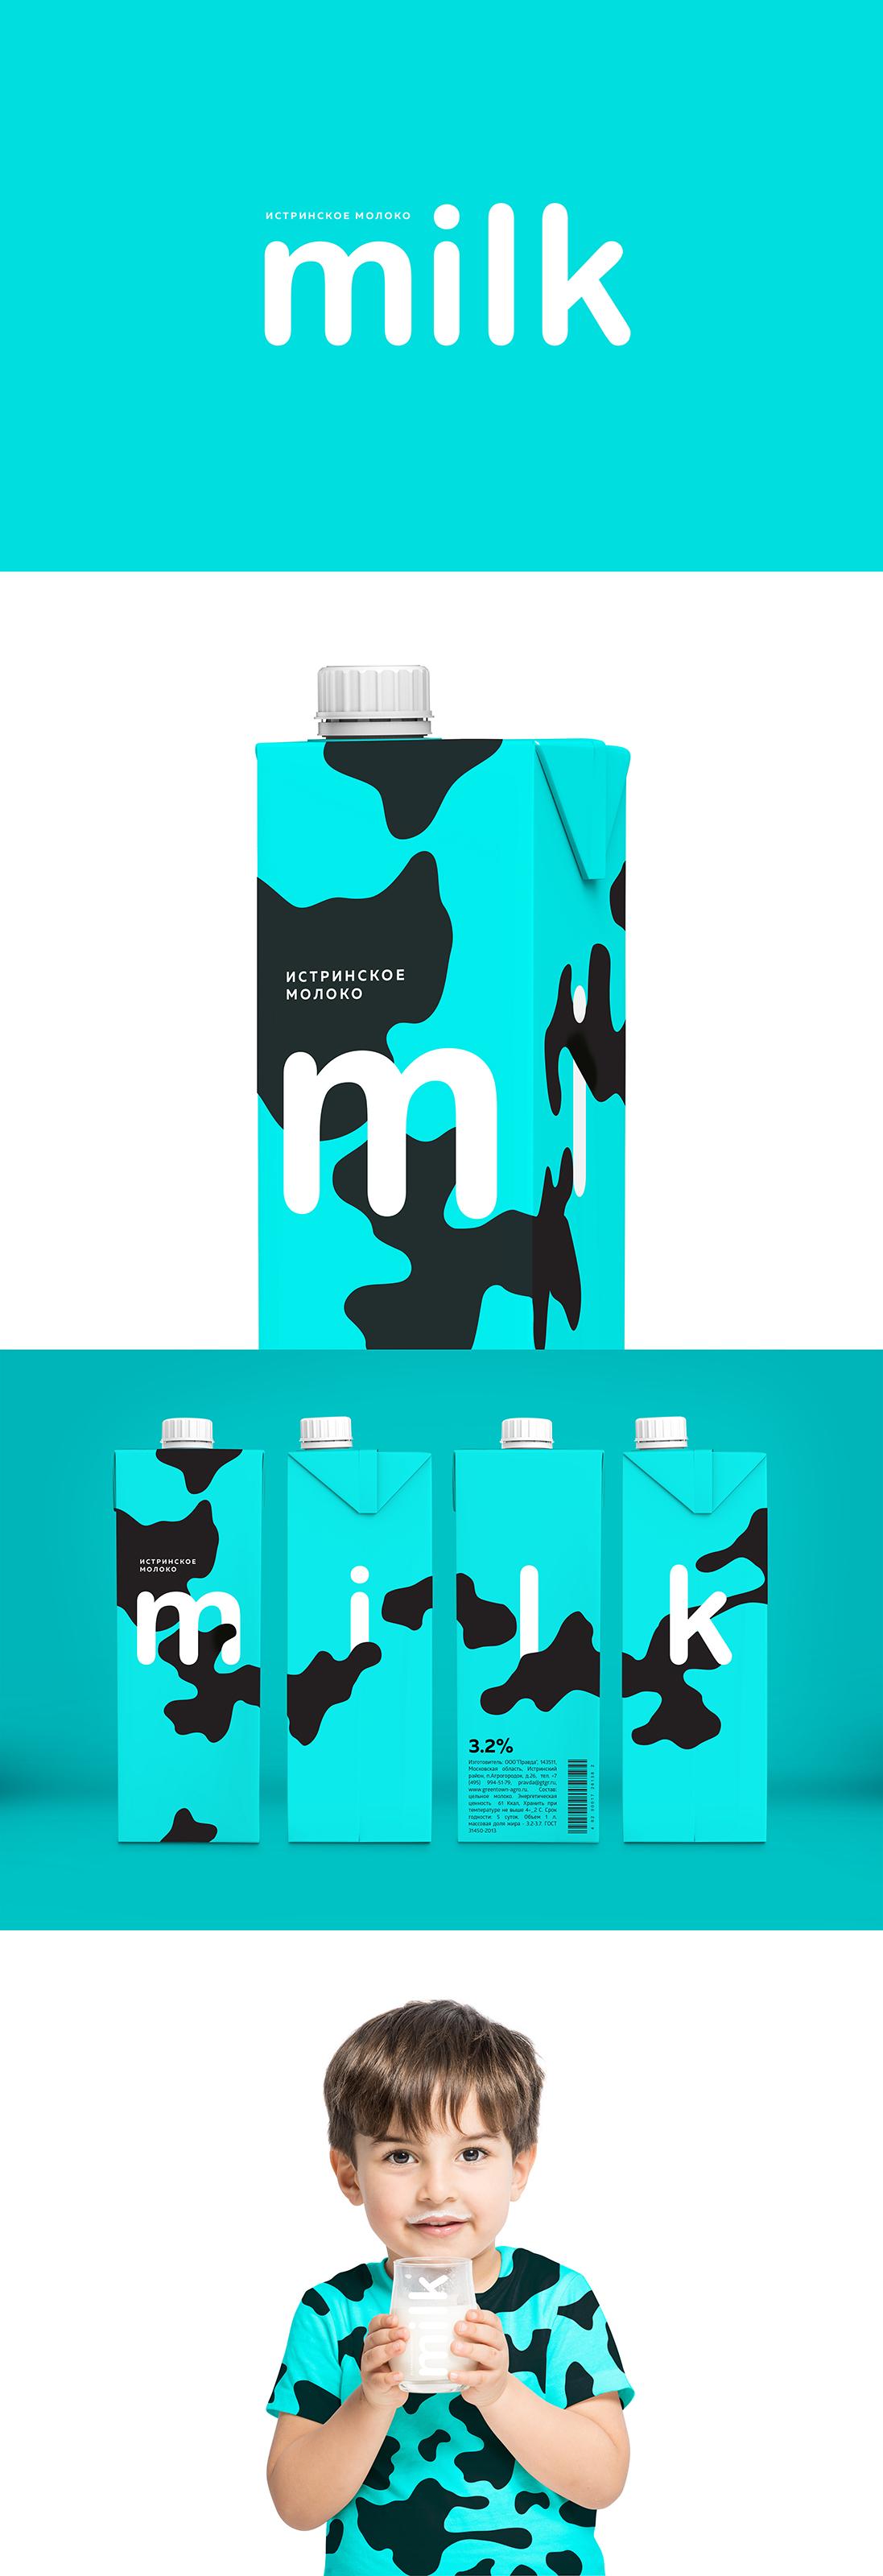 behance.net/gallery/58245833/Milk-pack